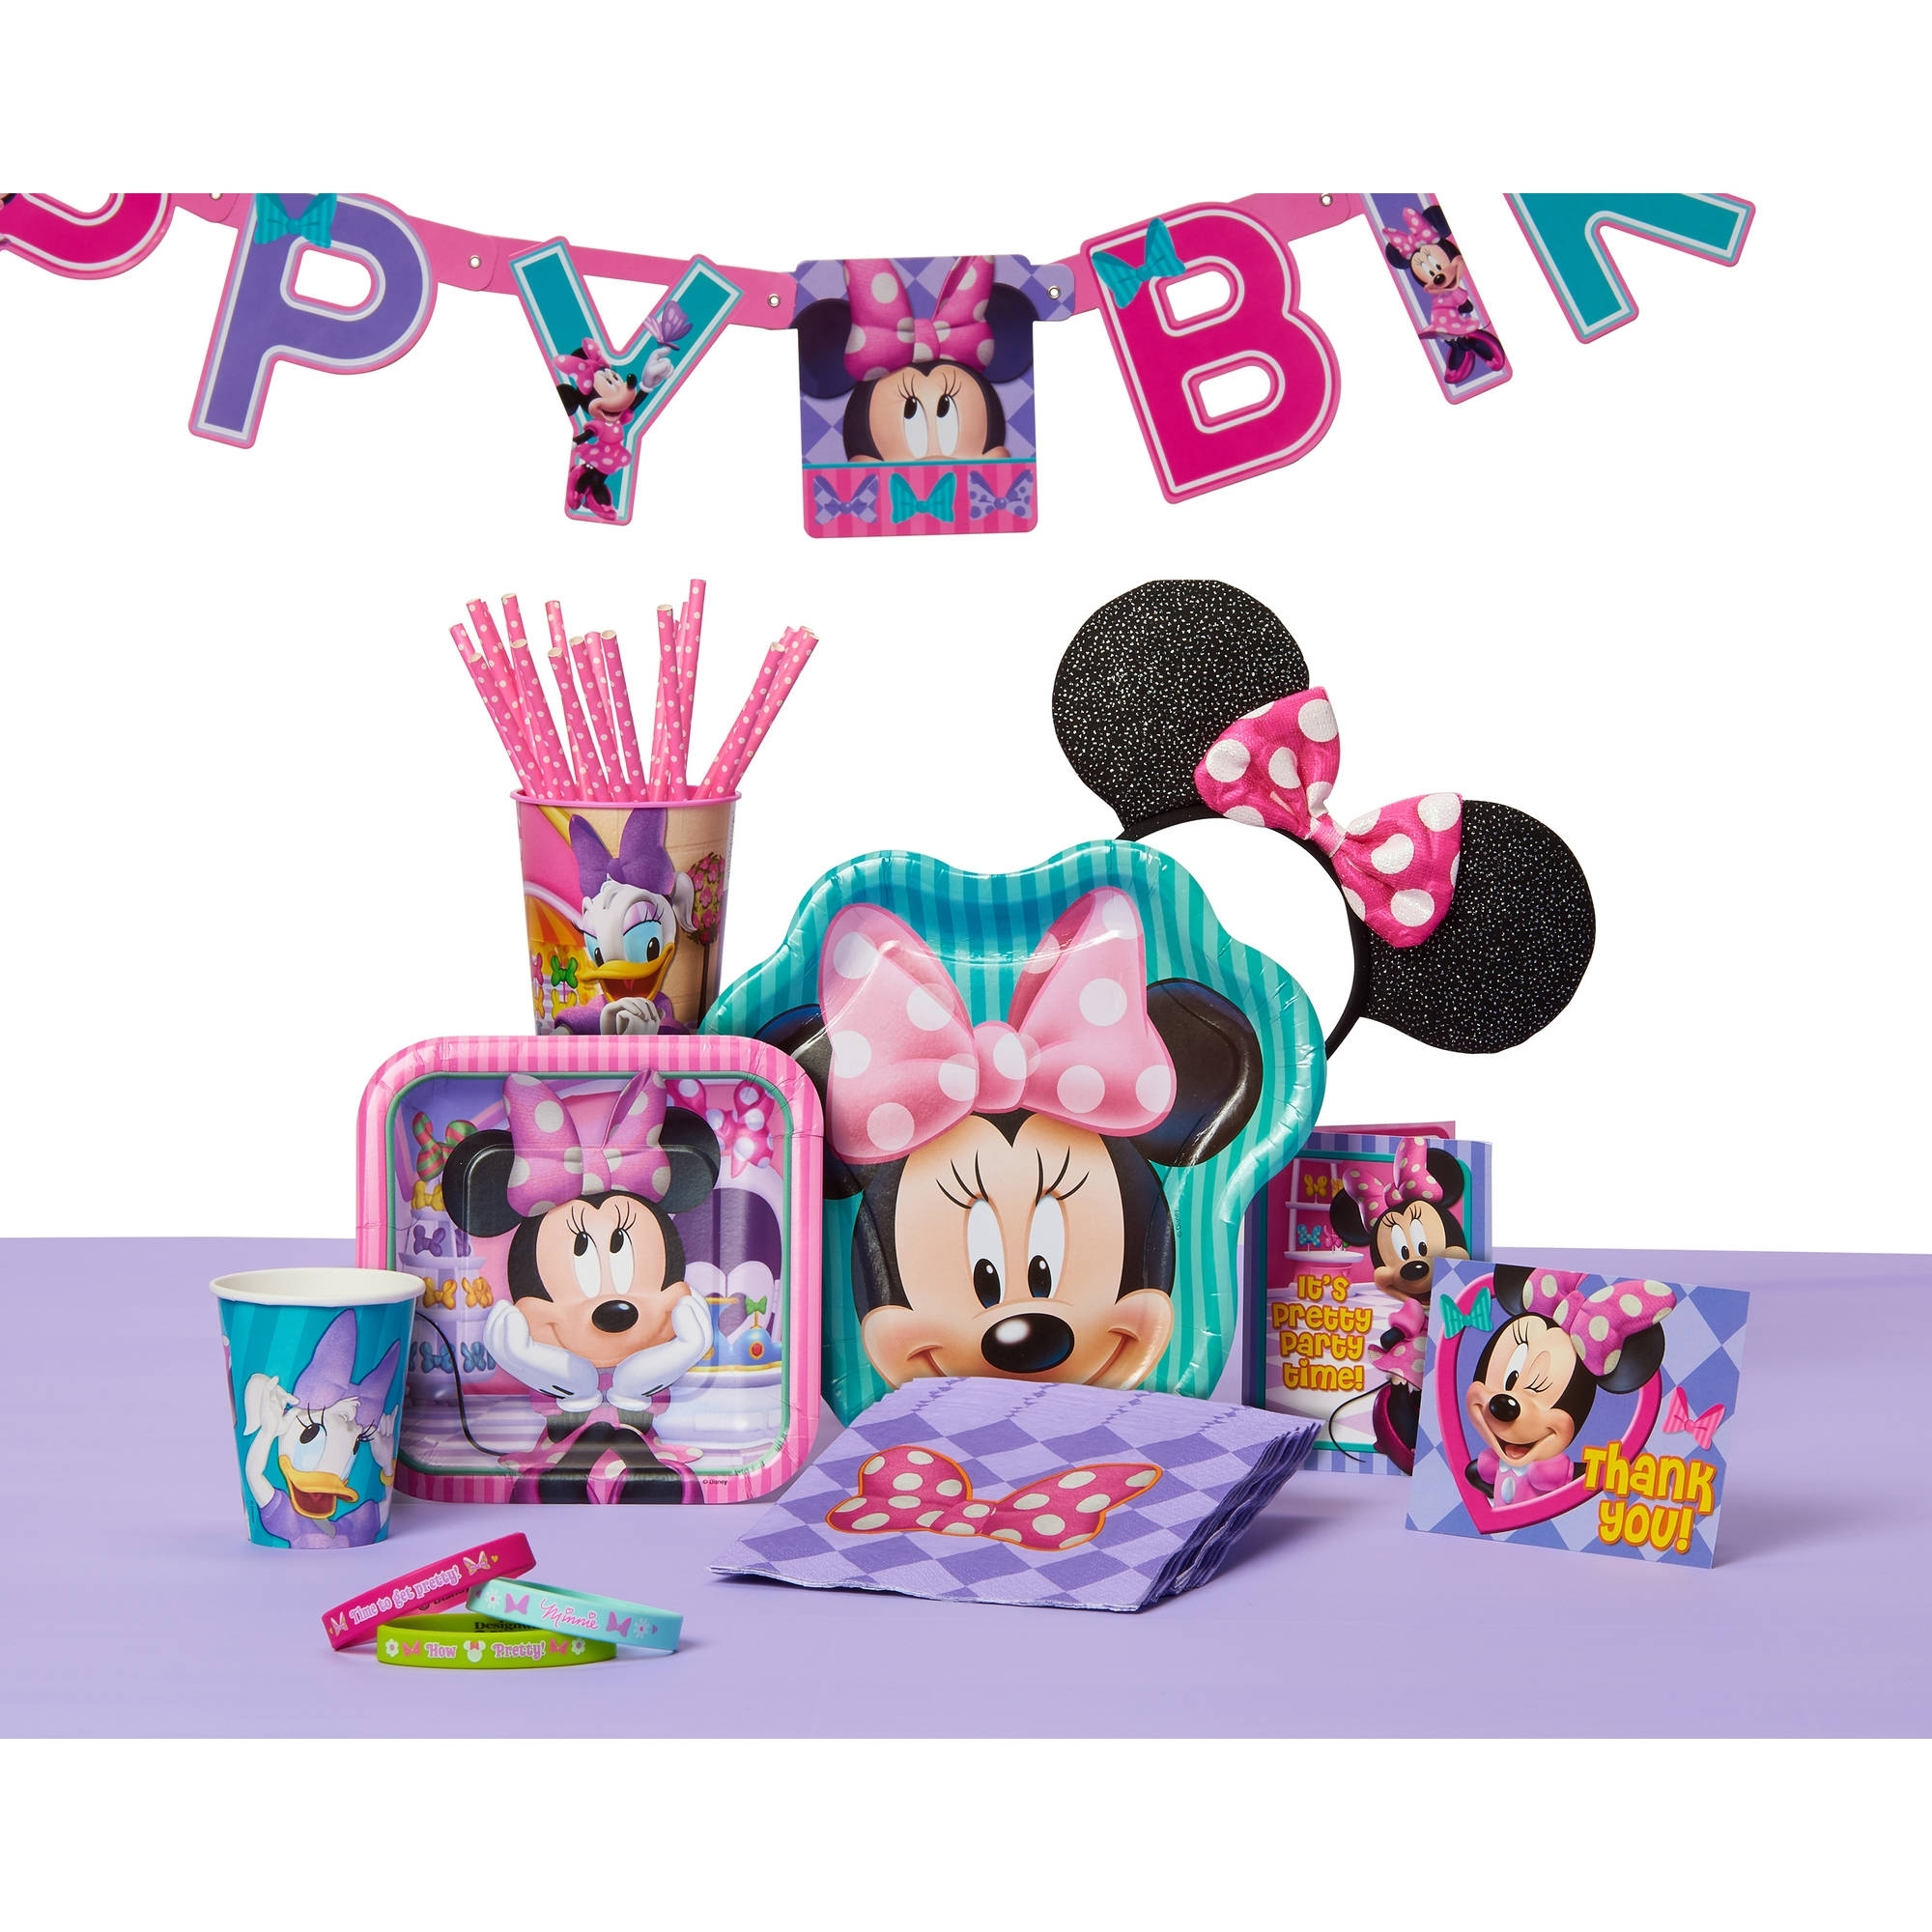 10 Wonderful Minnie Mouse Bowtique Party Ideas %name 2020